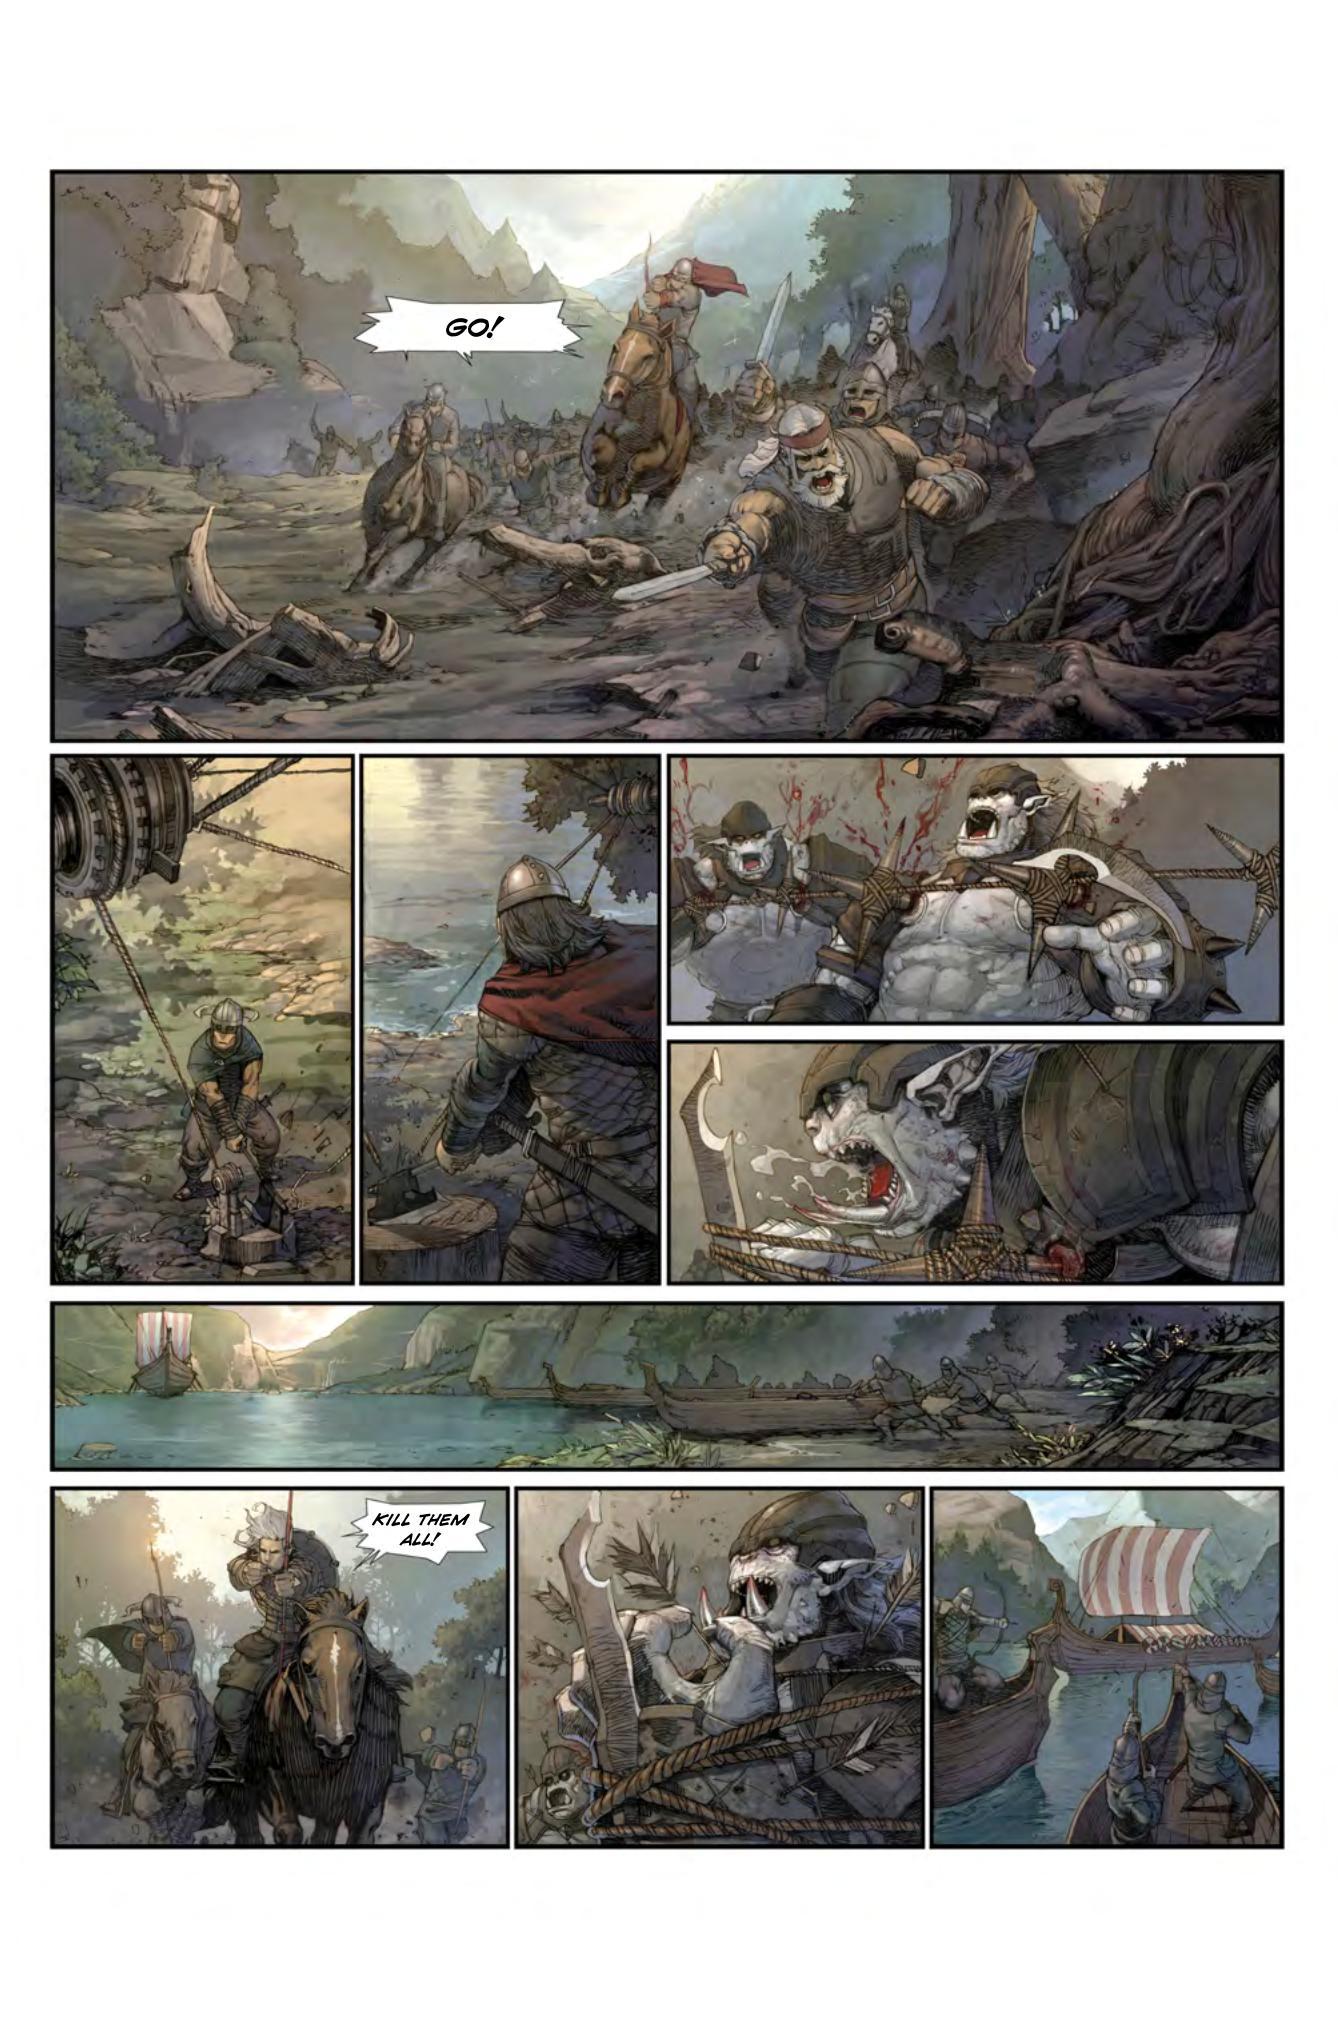 Konungar War of Crowns review